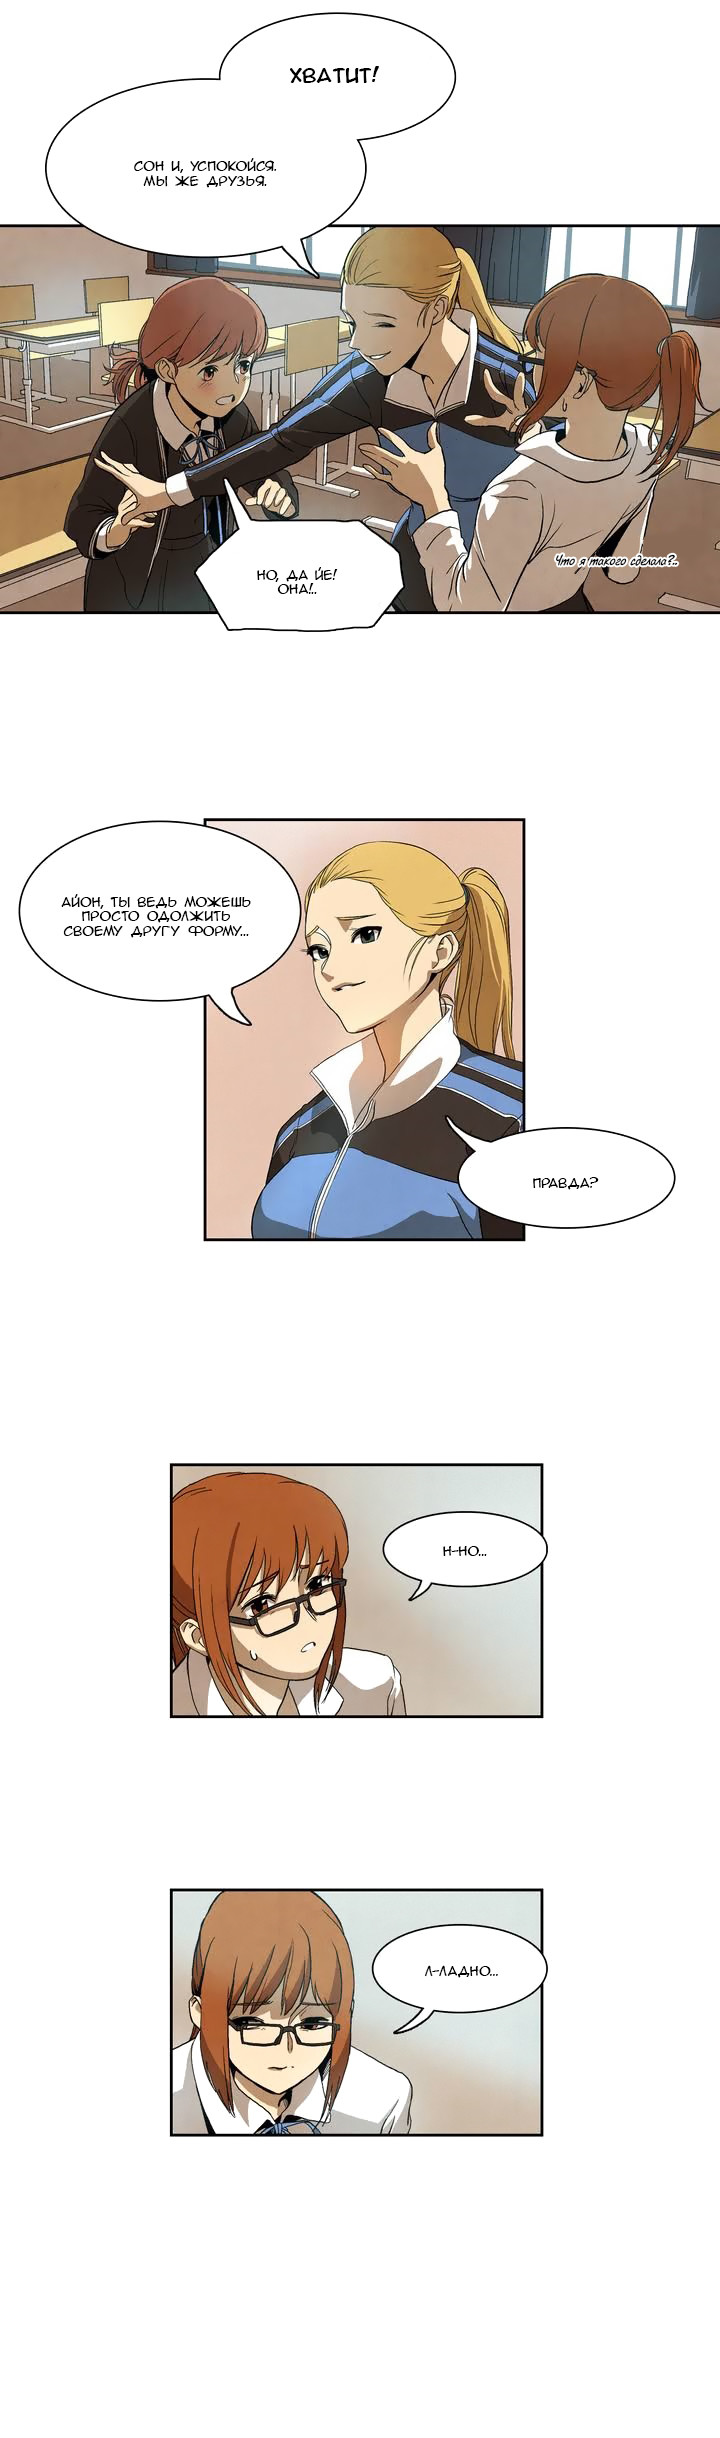 https://r1.ninemanga.com/comics/pic2/2/35010/875938/1539188485188.jpg Page 5